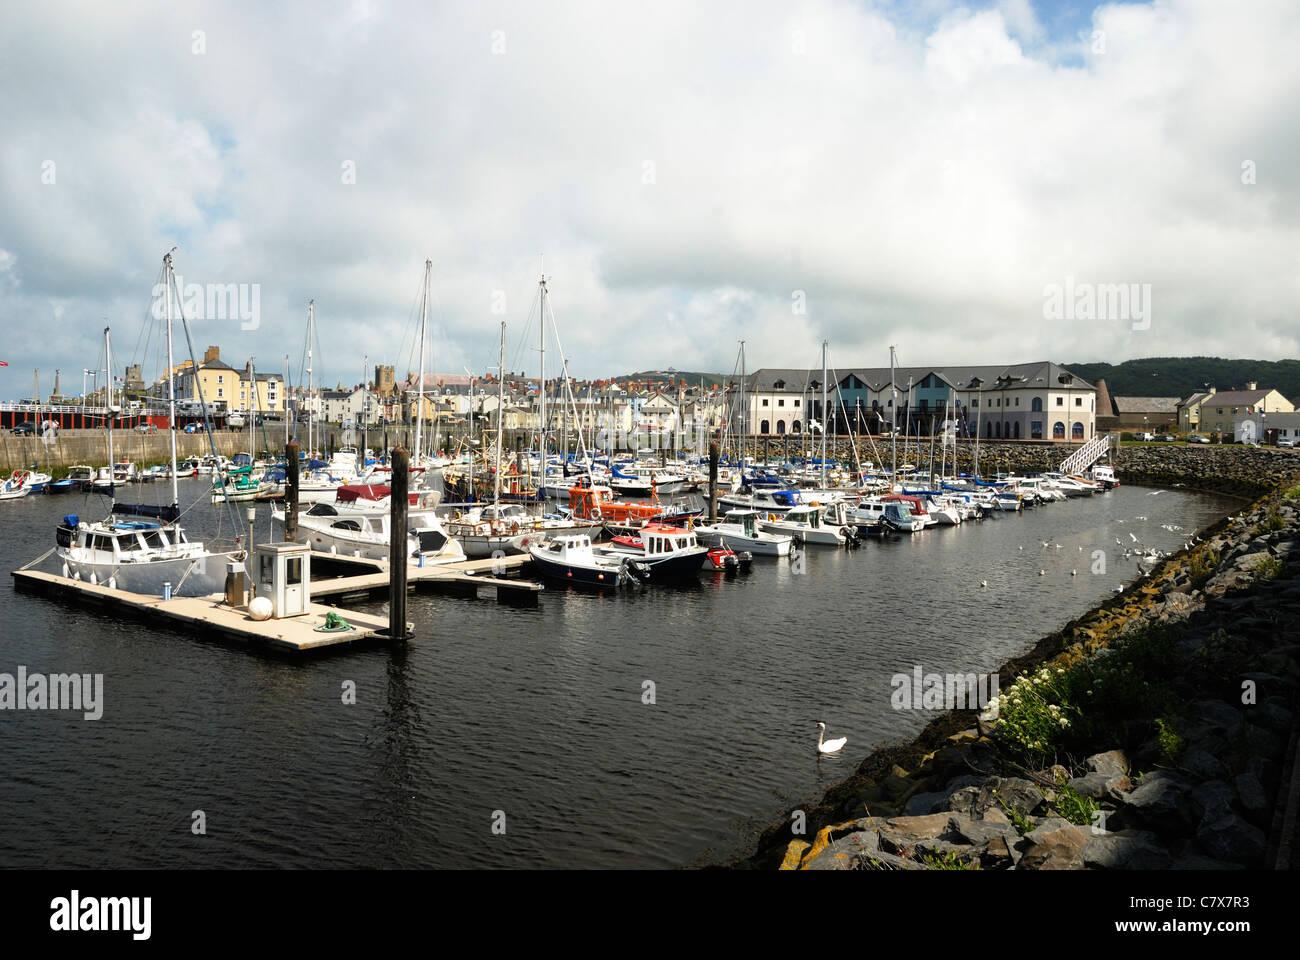 Aberystwyth marina, Wales - Stock Image